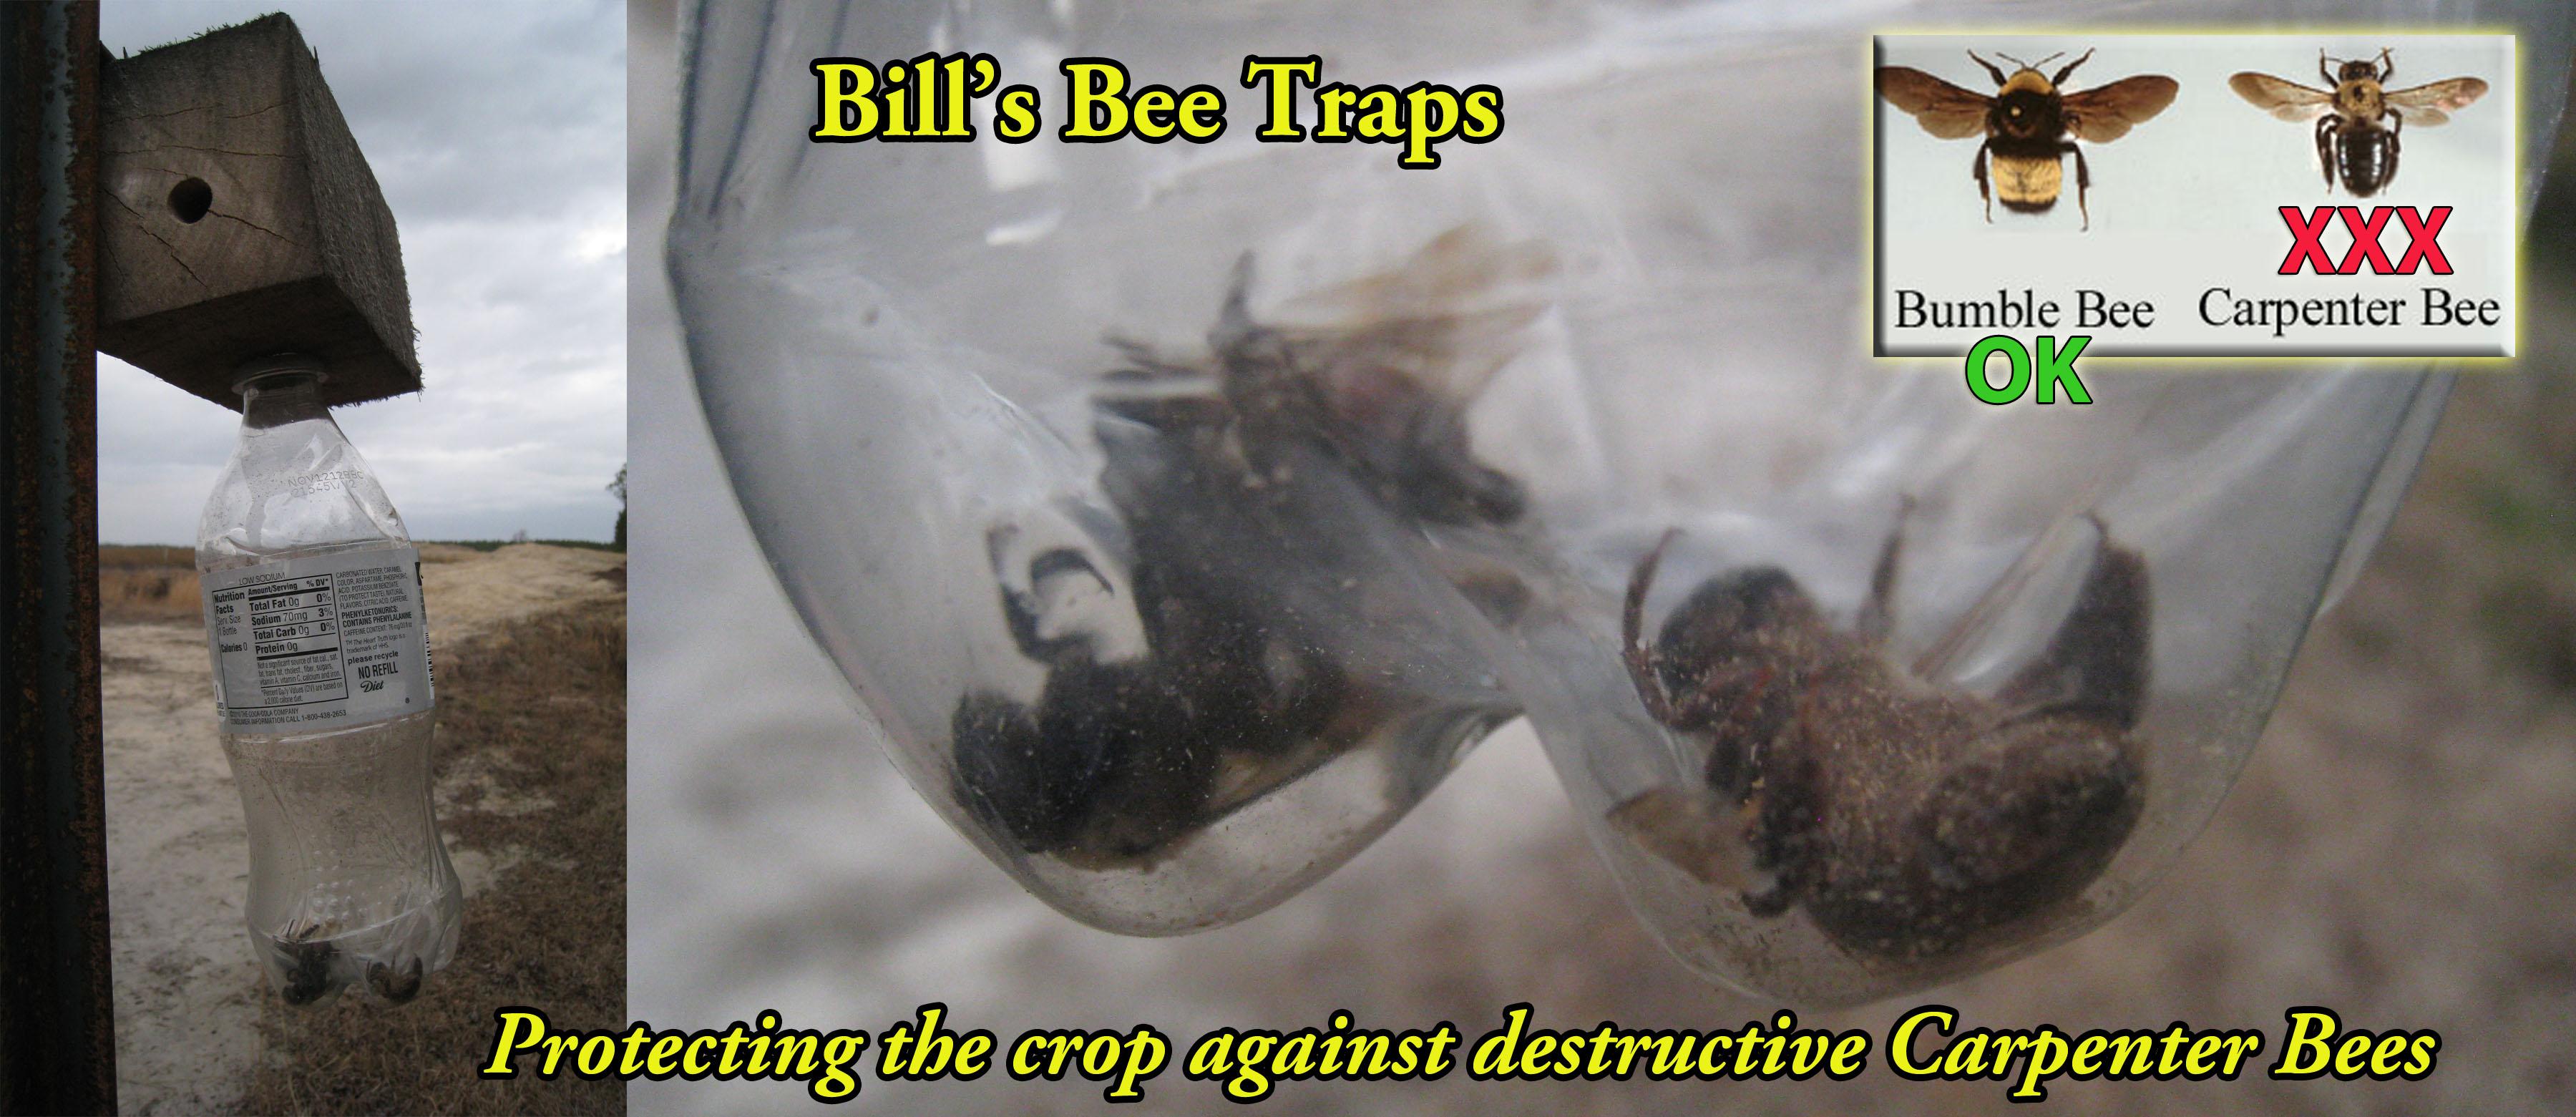 Carpenter Bees are bad!